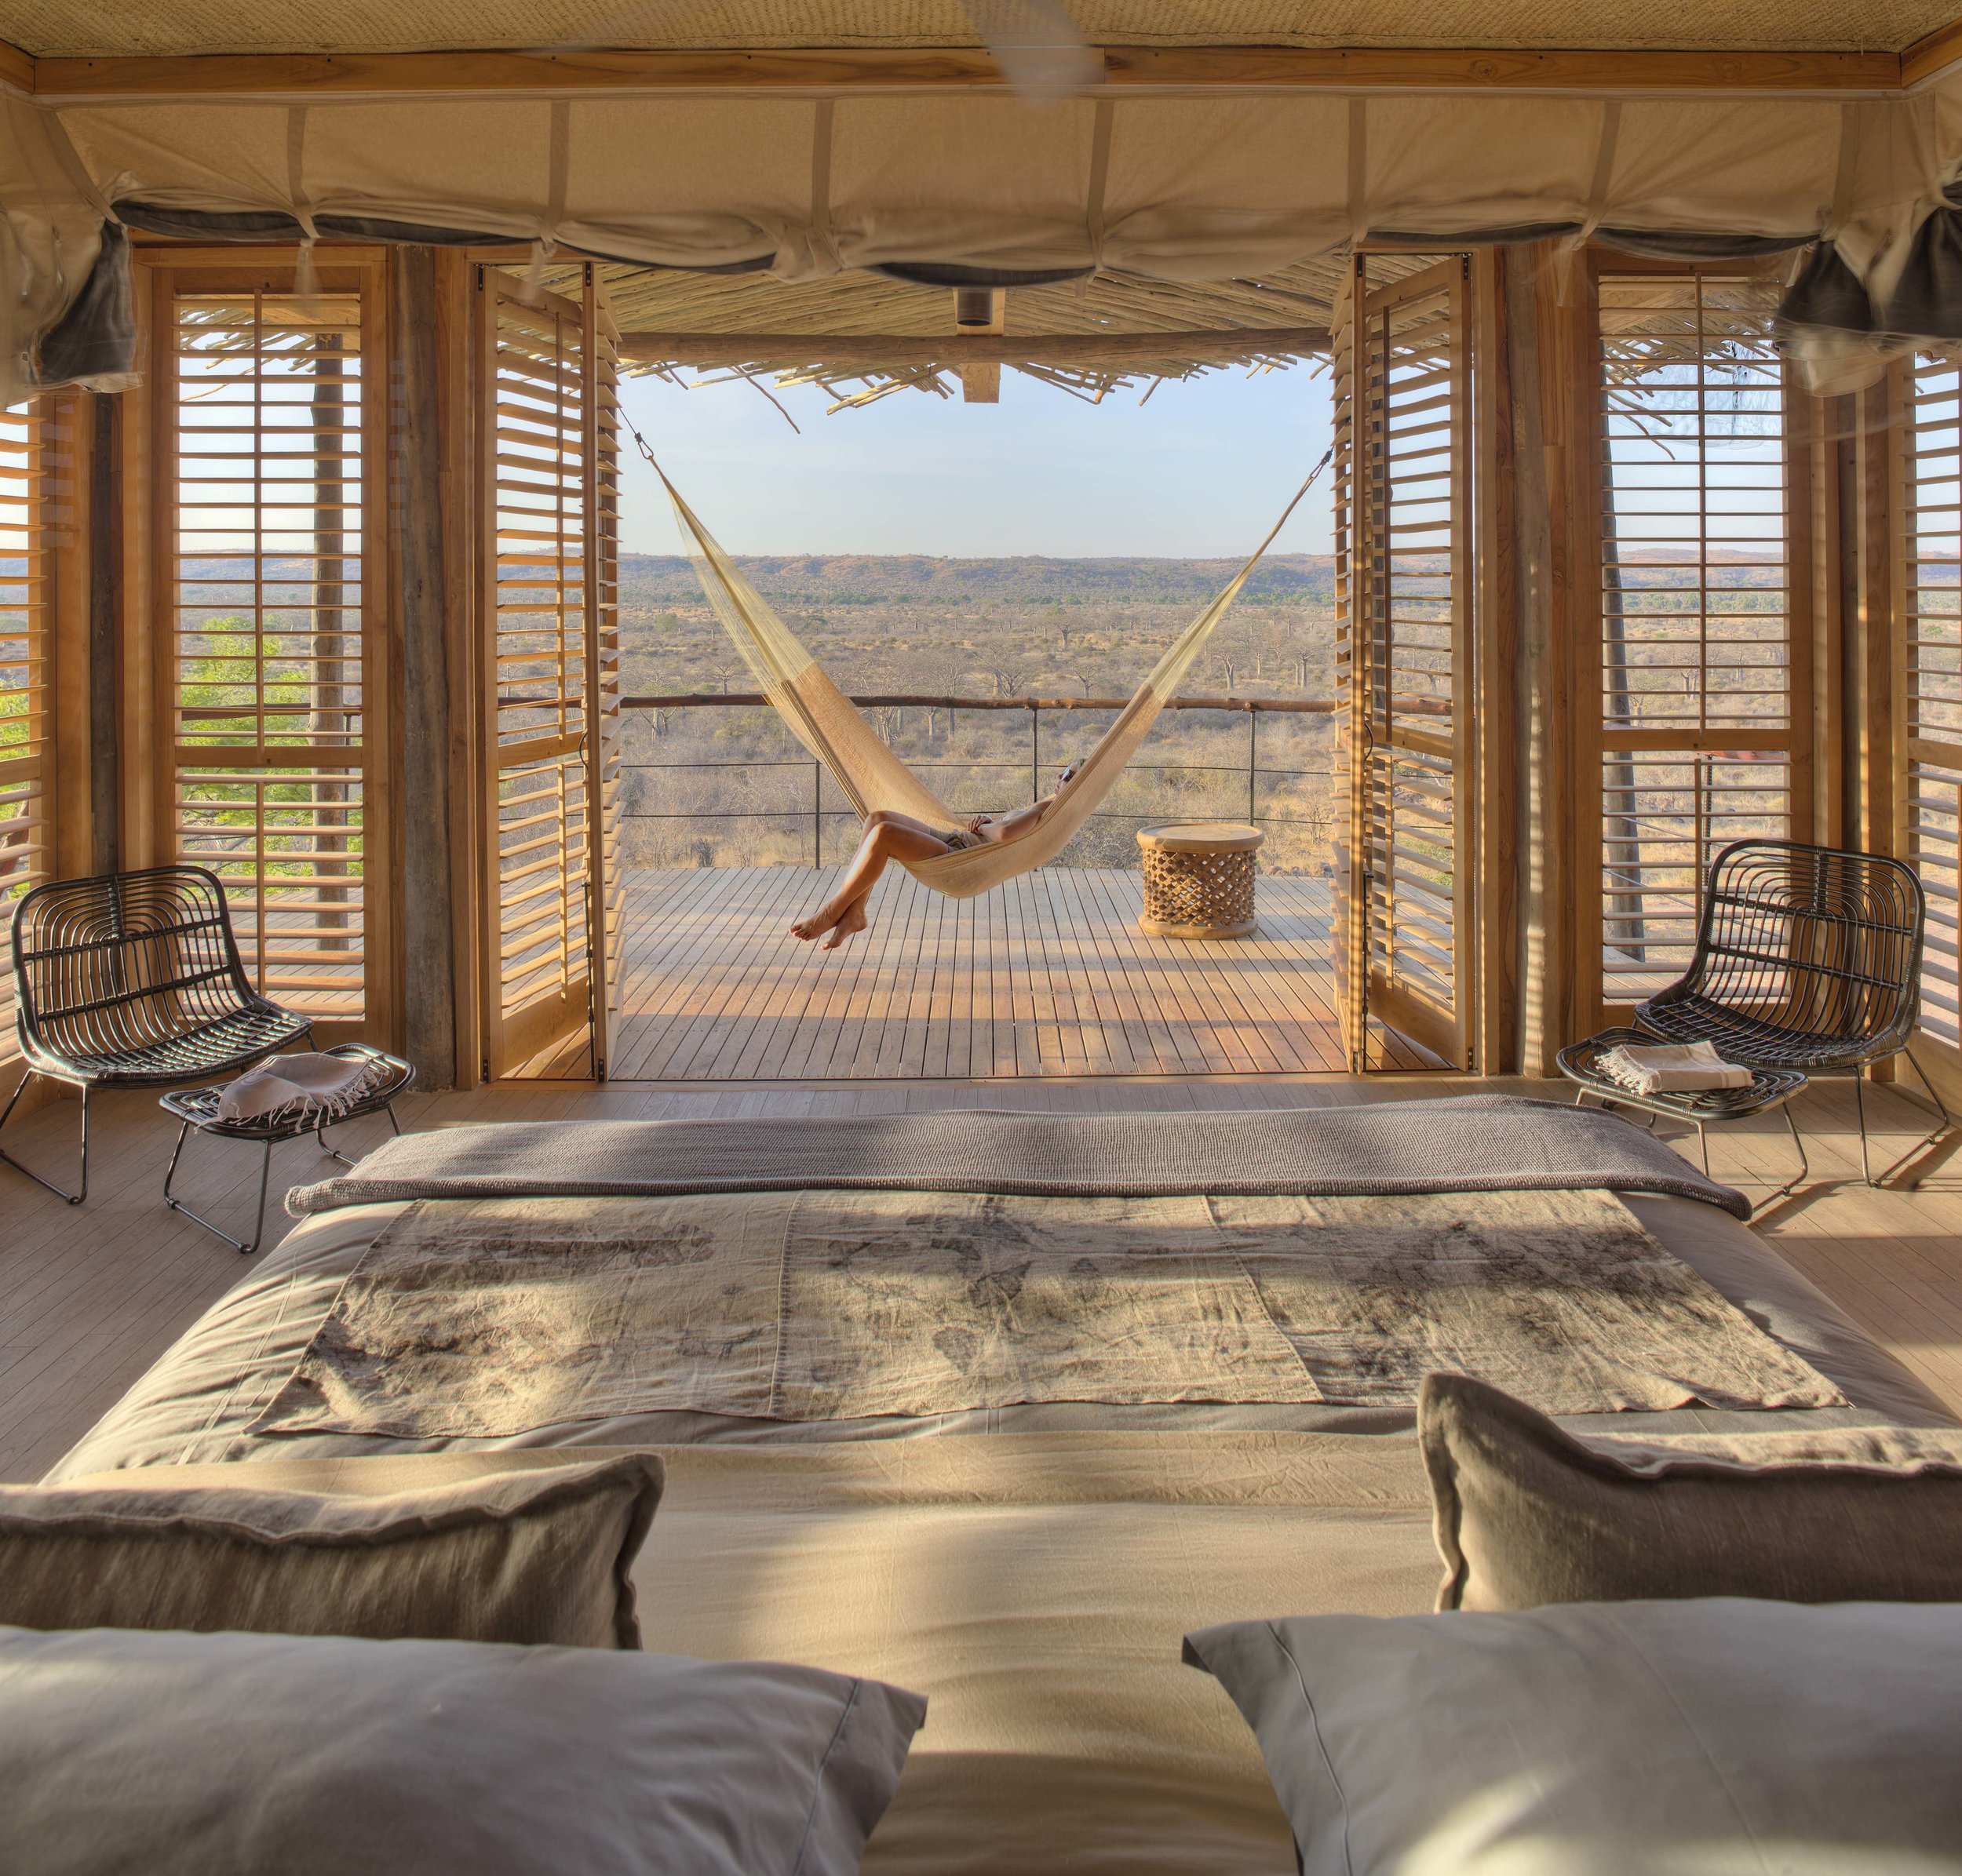 Jabali-hammock-and-view.jpg